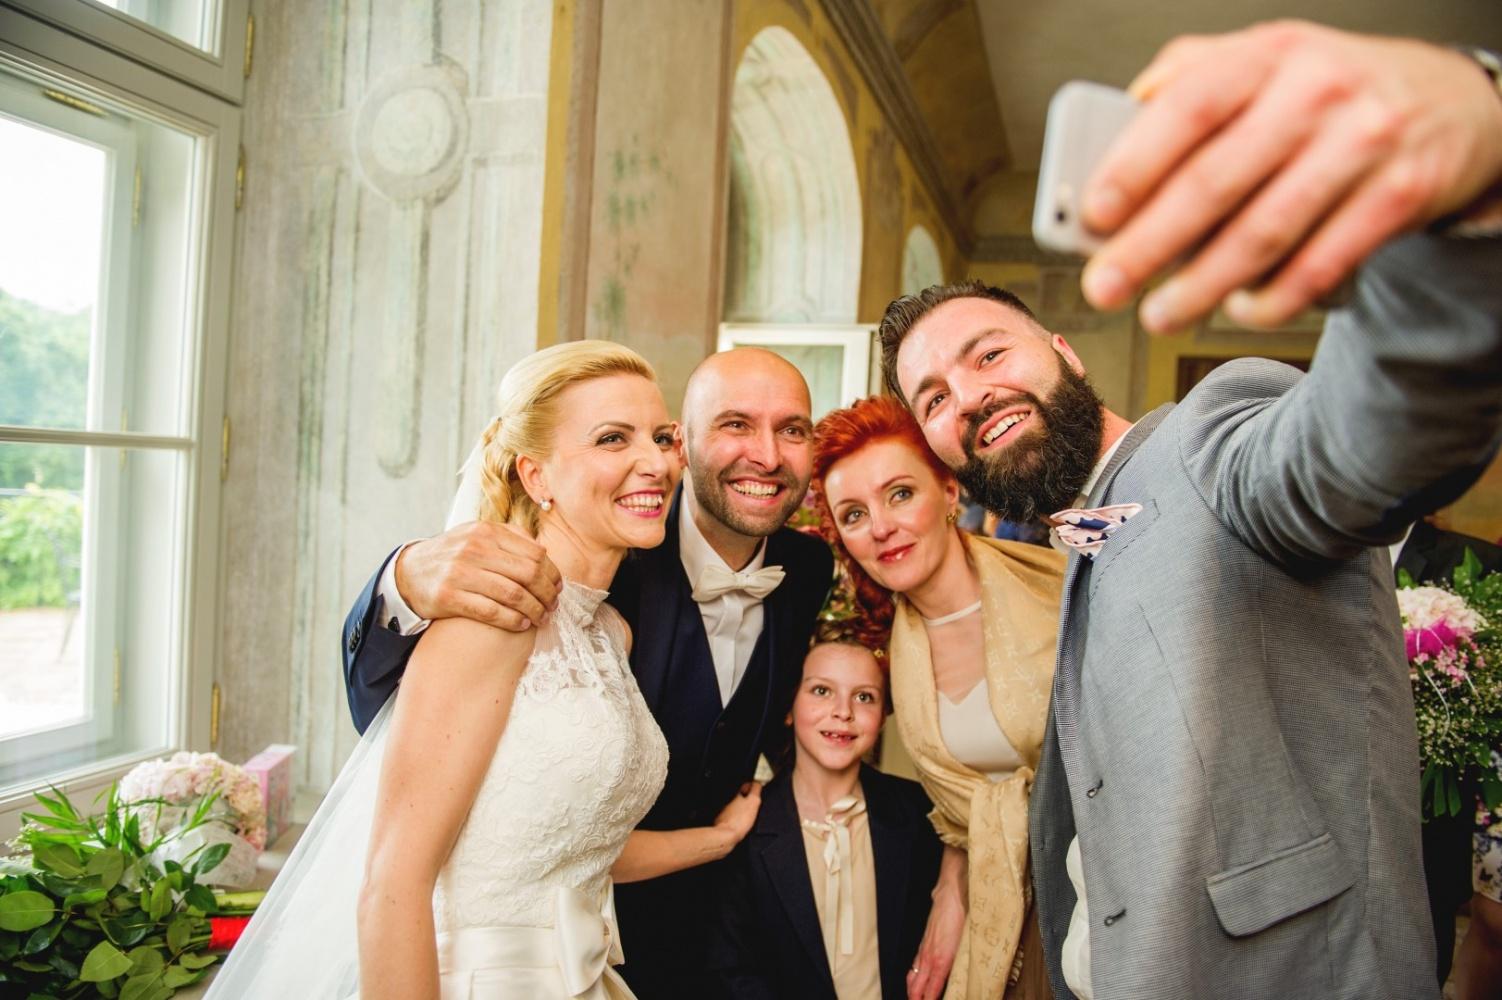 http://www.fotoz.sk/images/gallery-26/normal/svadba_hotel-chateau-bela_098.jpg